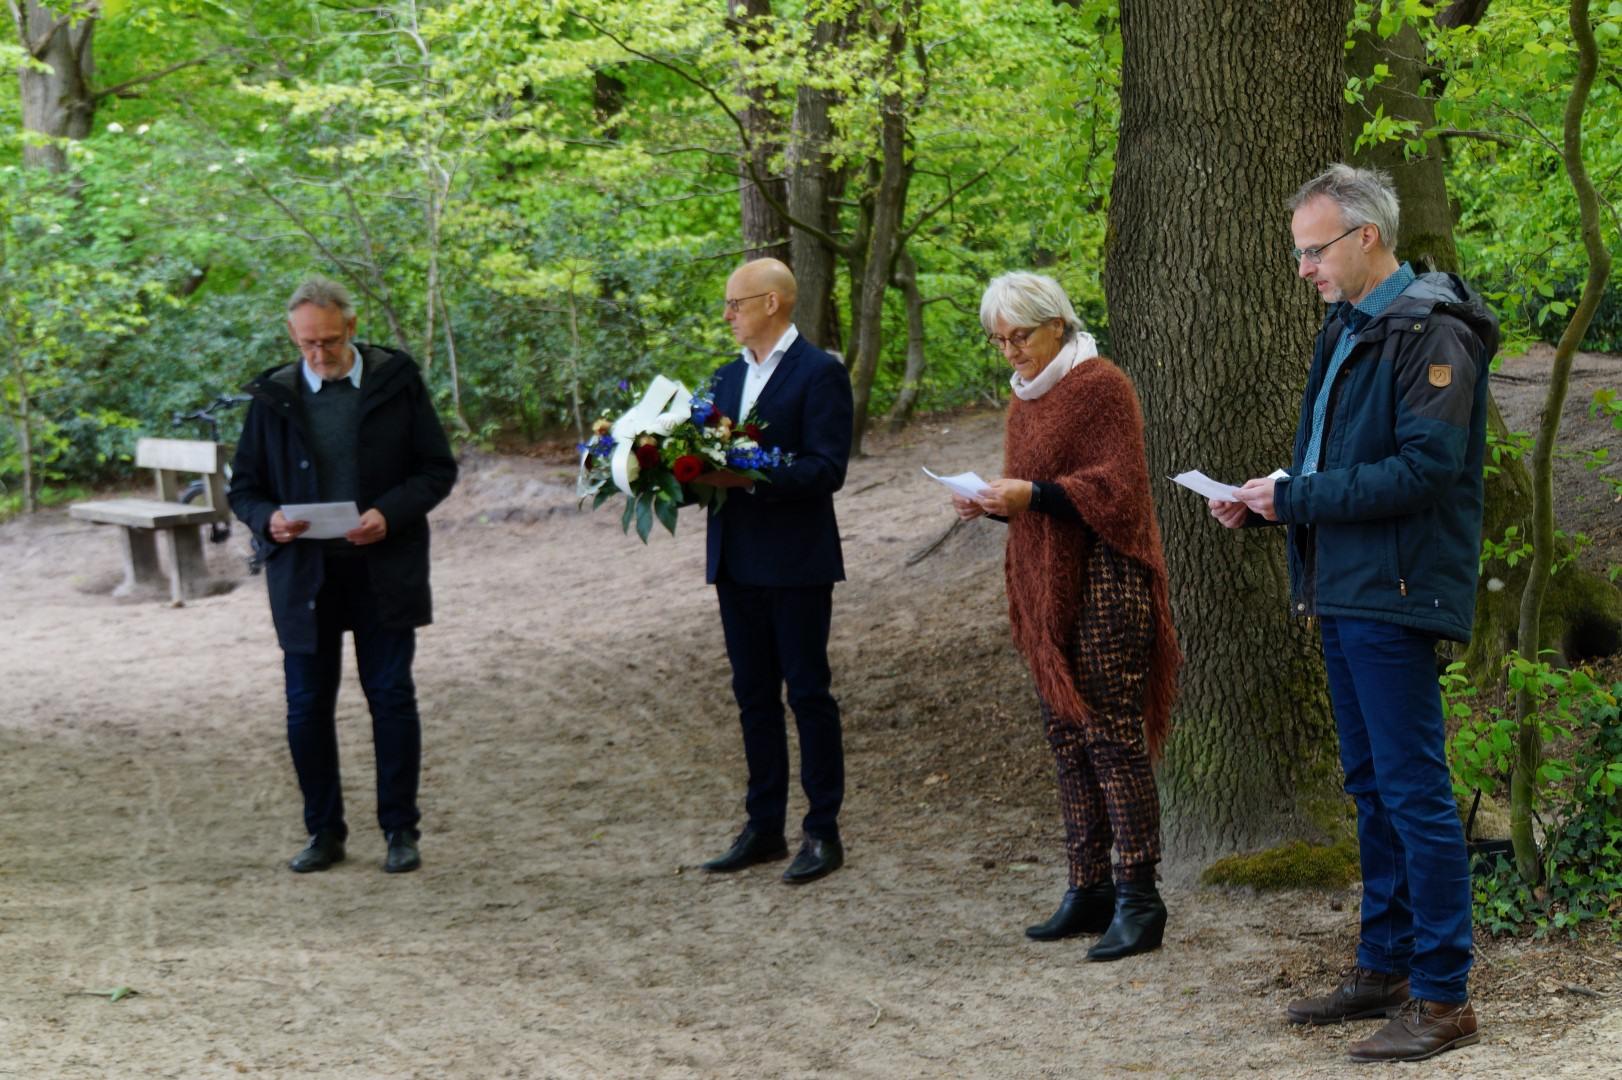 HerdenkingAppelbergen-3mei-2020-5